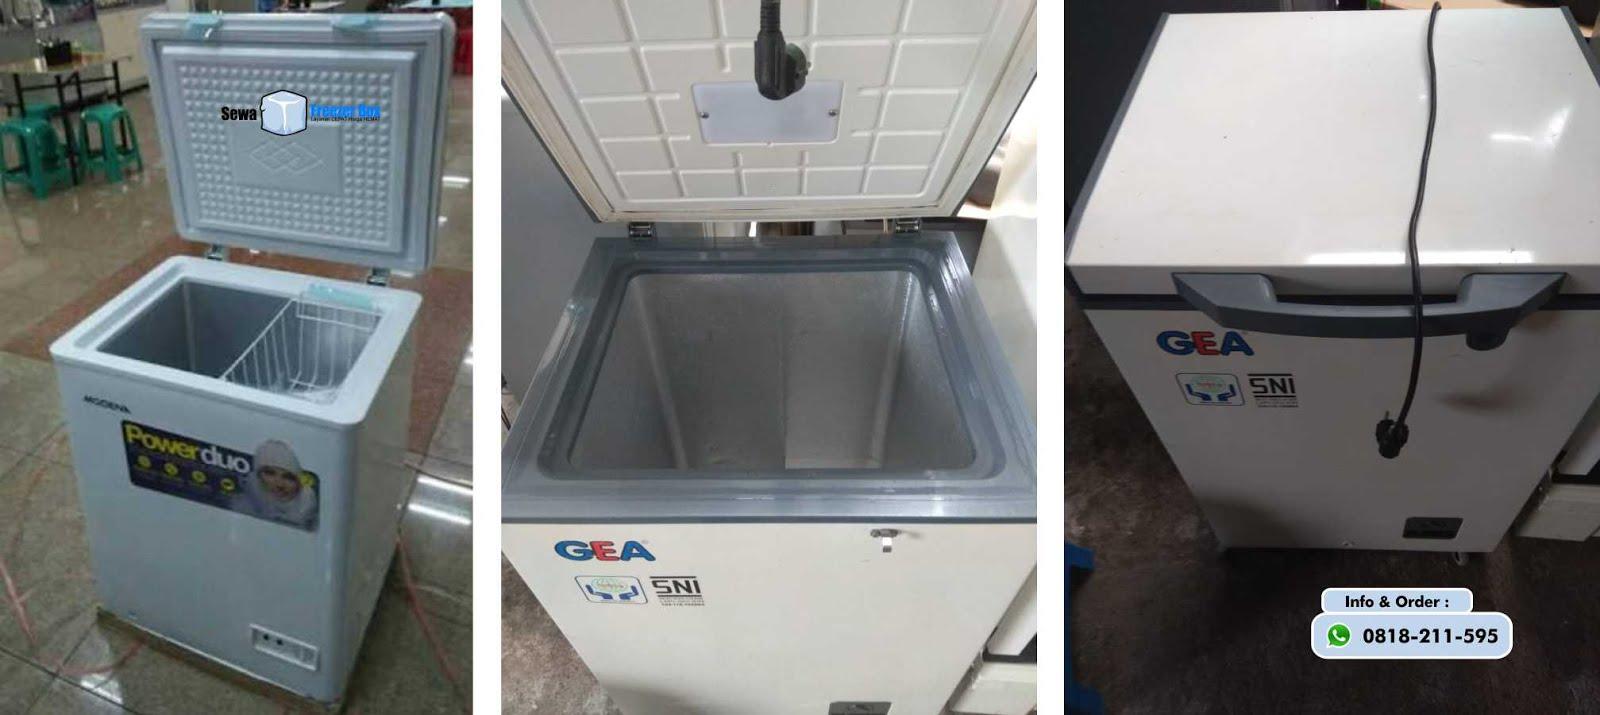 sewa freezer box 100 liter - sewafreezerbox.com